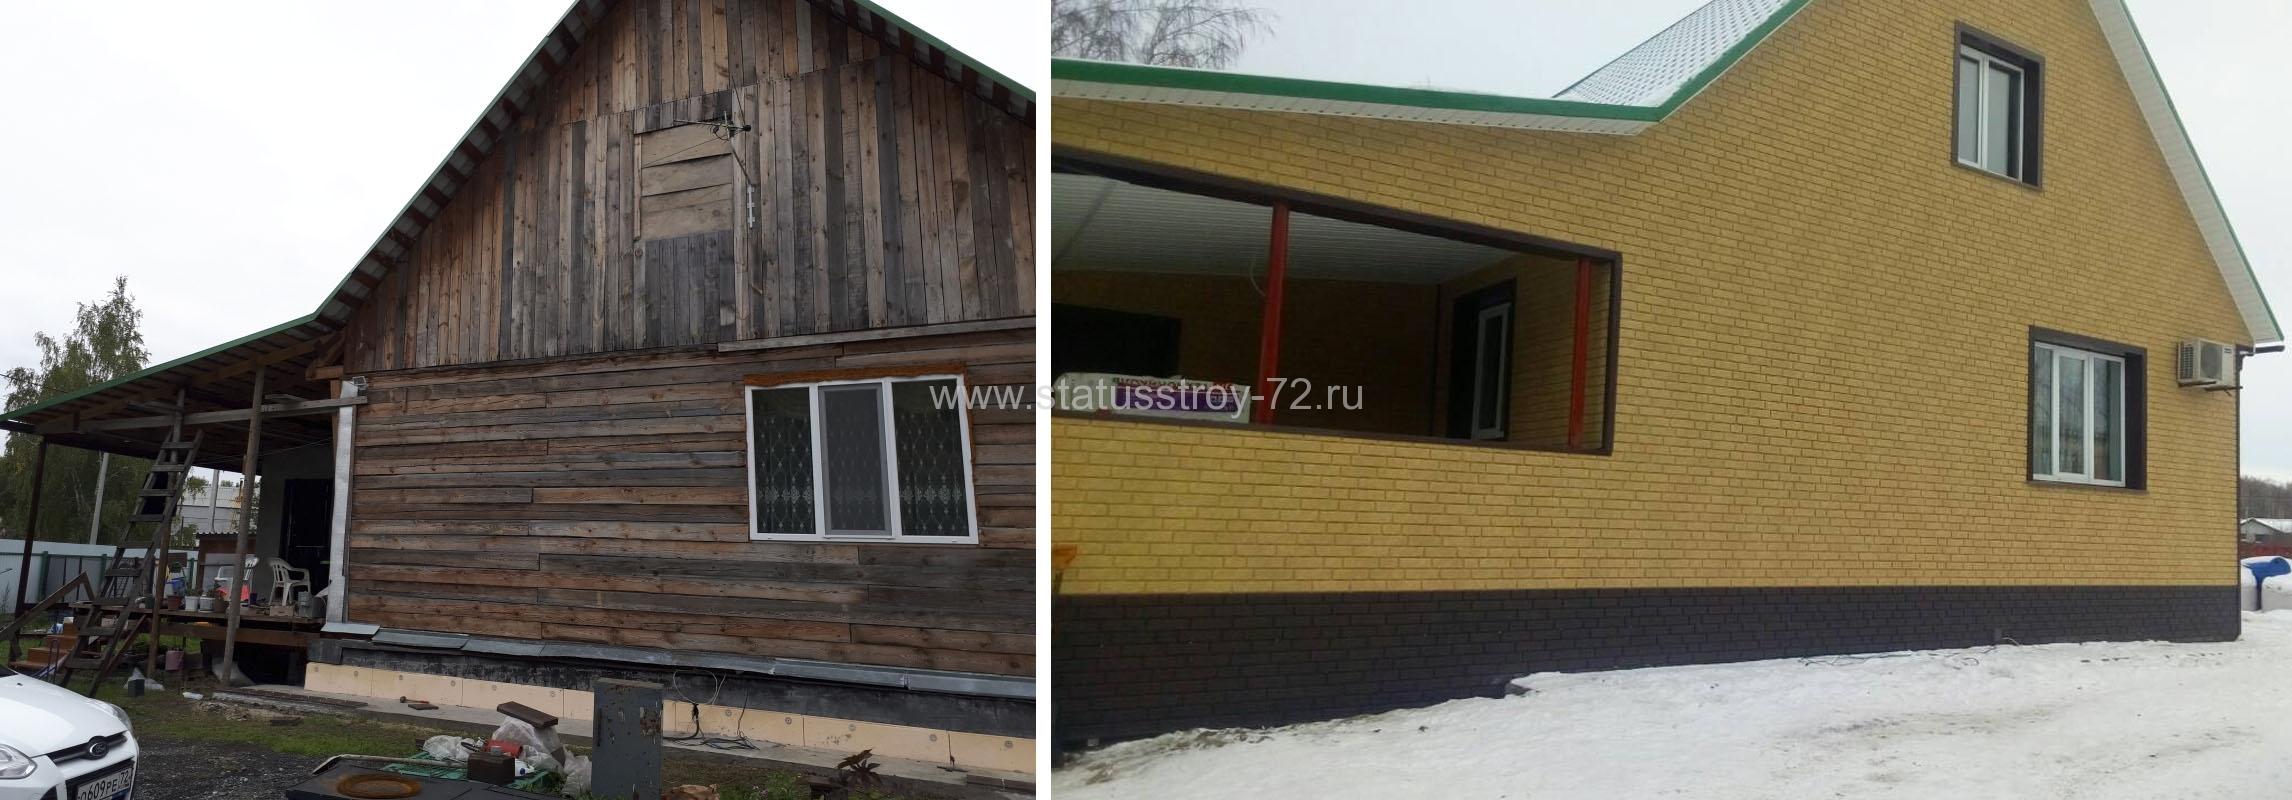 Утепление фасада дома в саратове